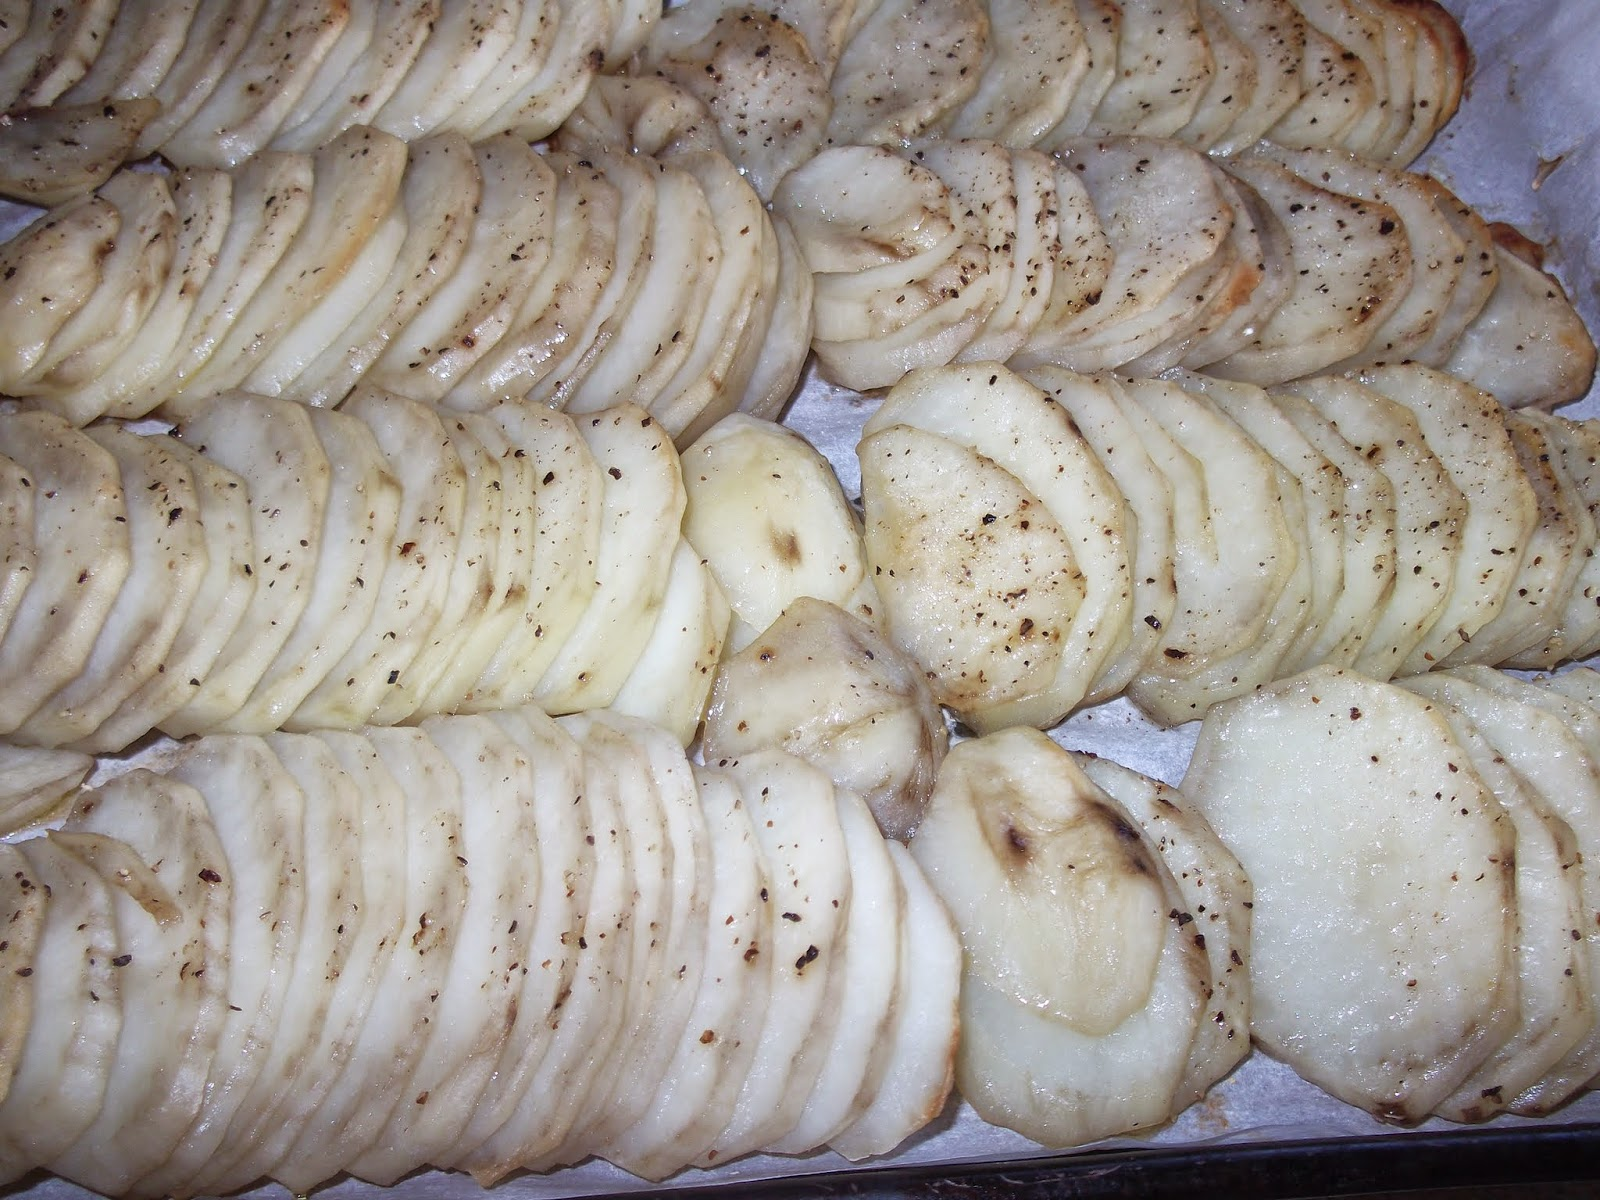 Domino Potatoes